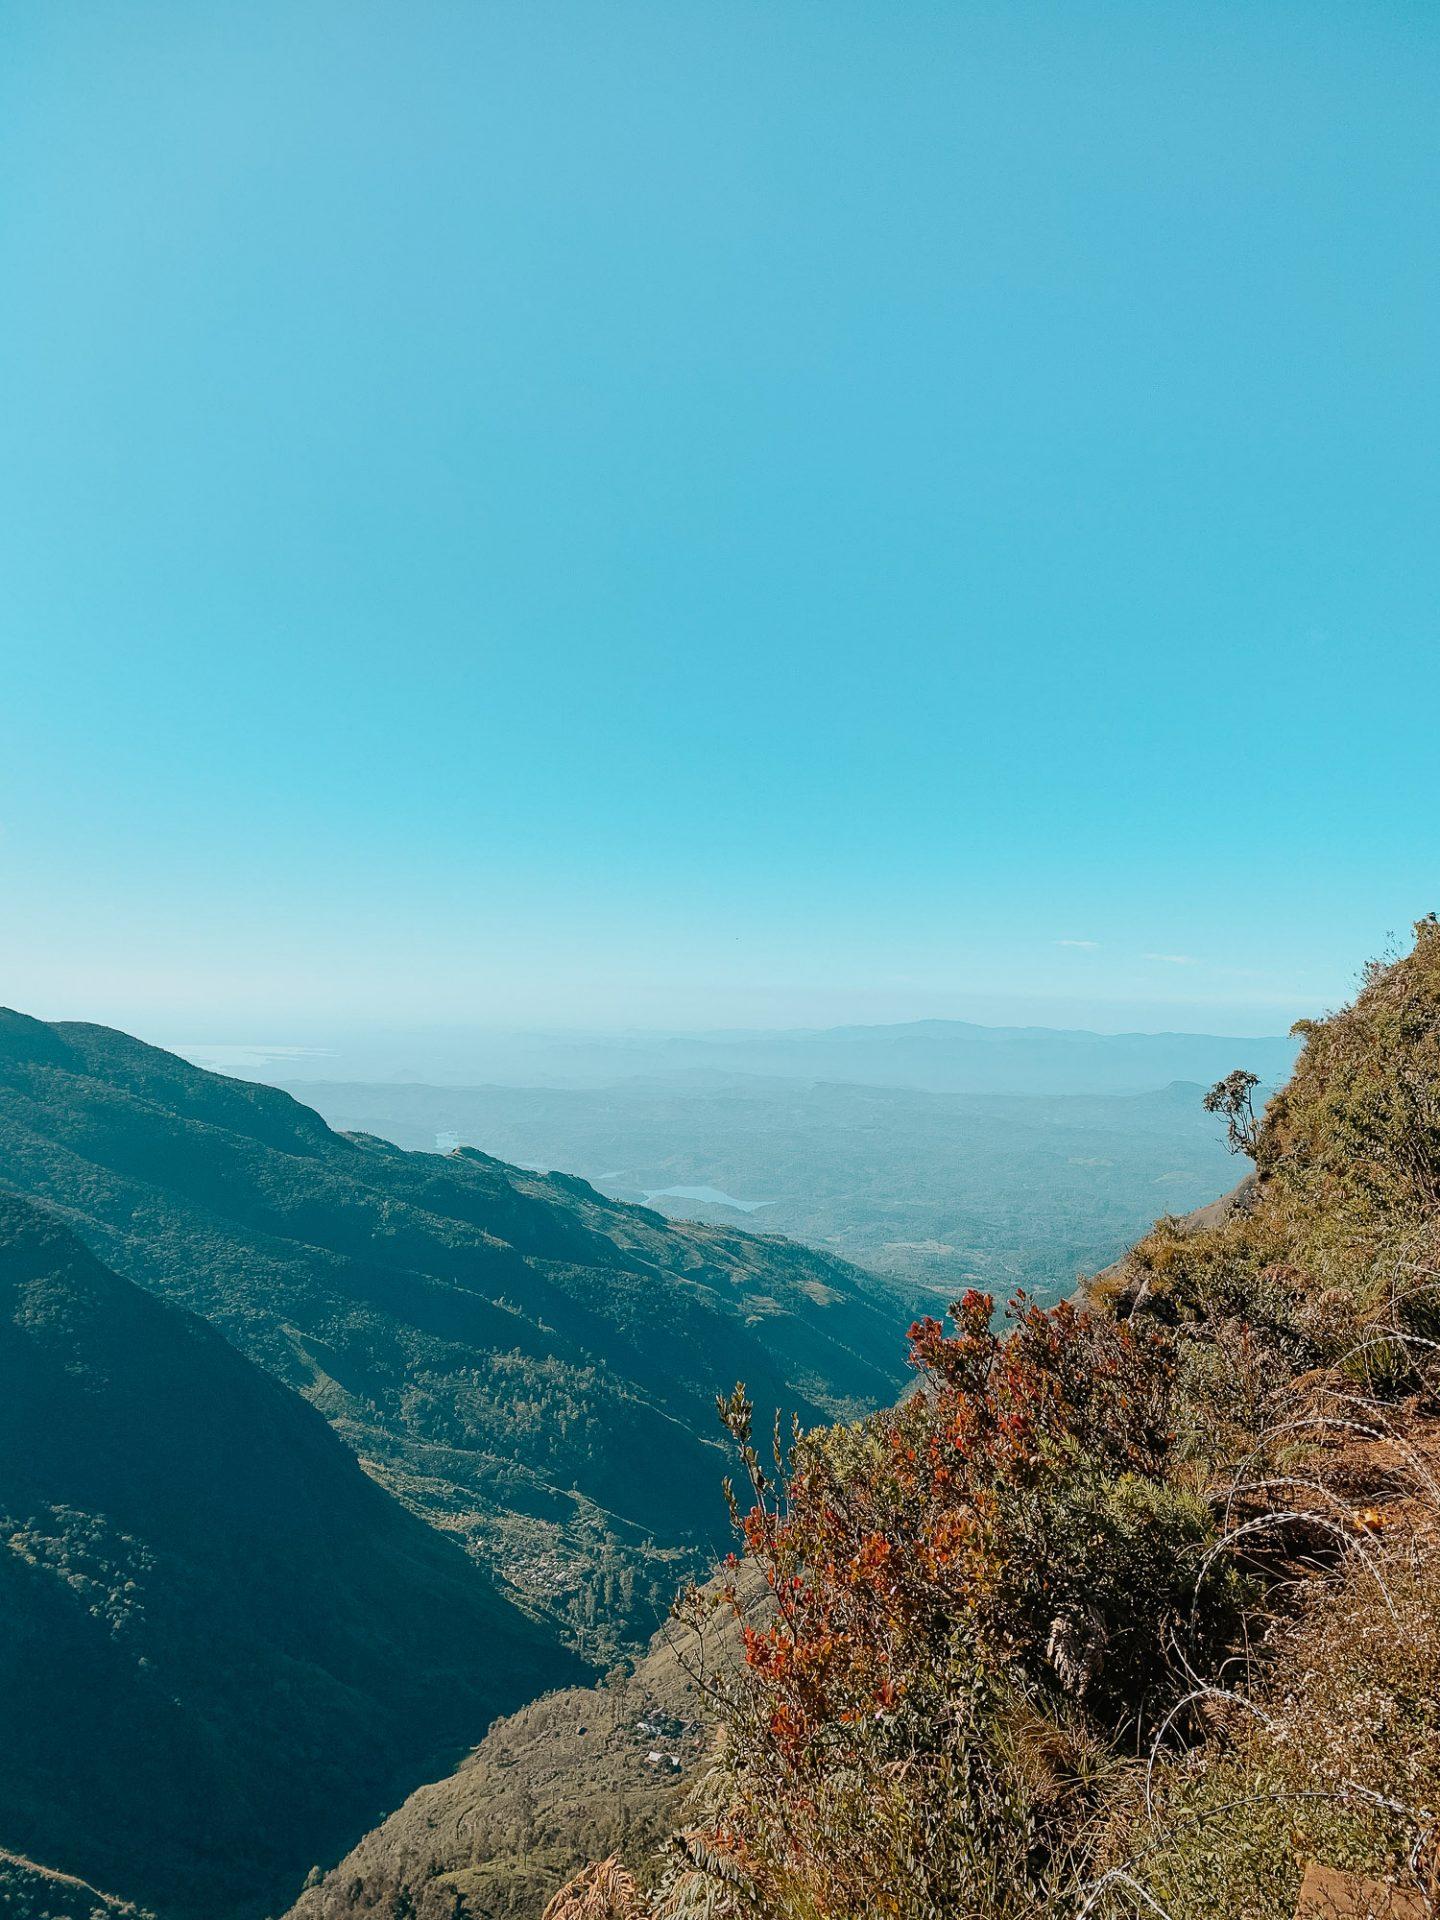 Horton Plains National Park Sri Lanka 3 week itinerary